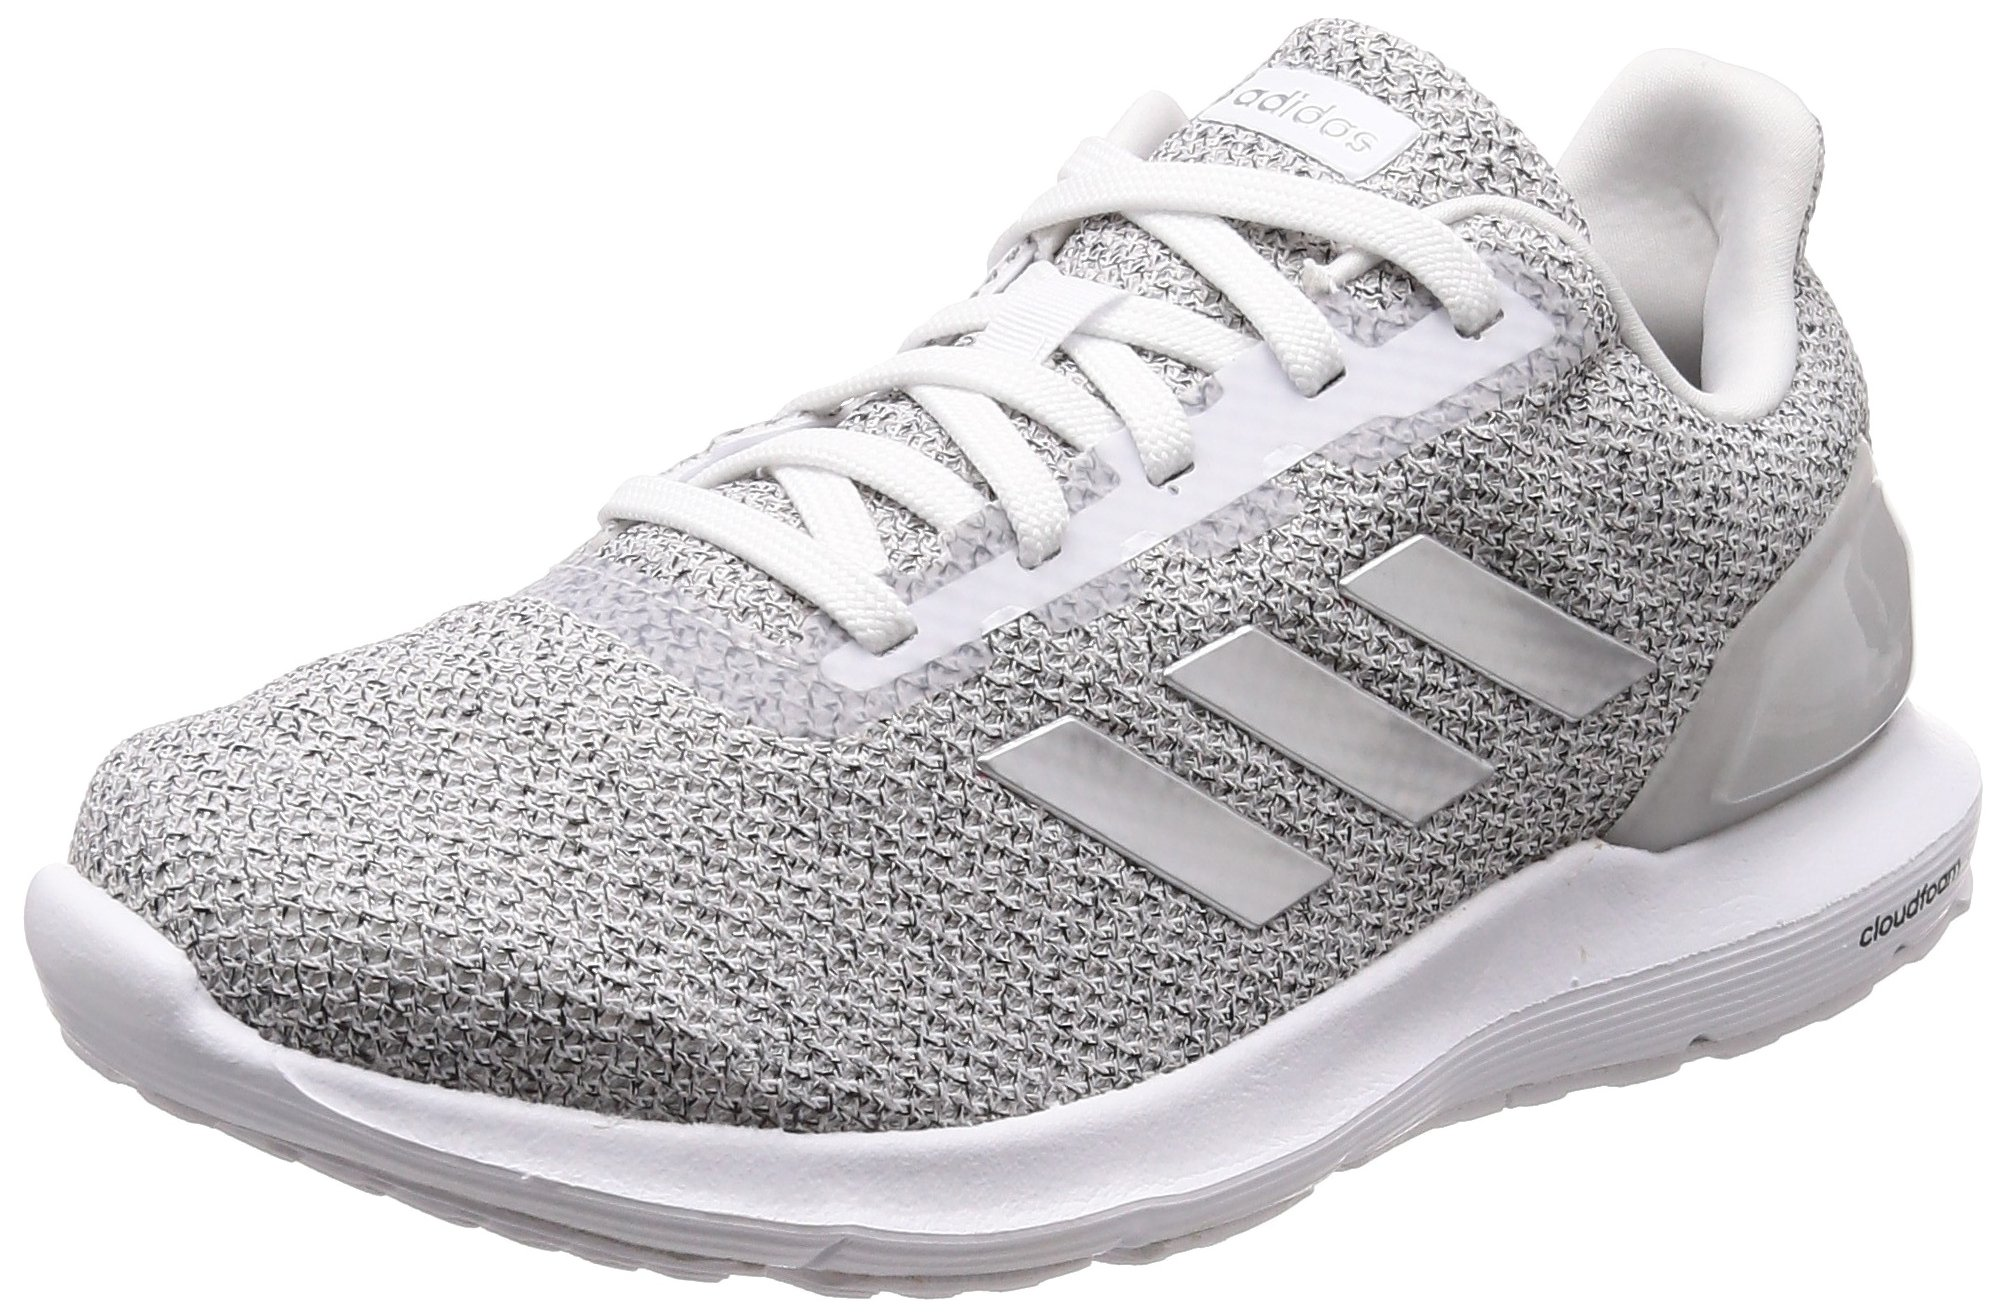 cf1e53fc6ca Galleon - Adidas Women Running Cosmic 2.0 Shoes Cloudfoam Trainers .